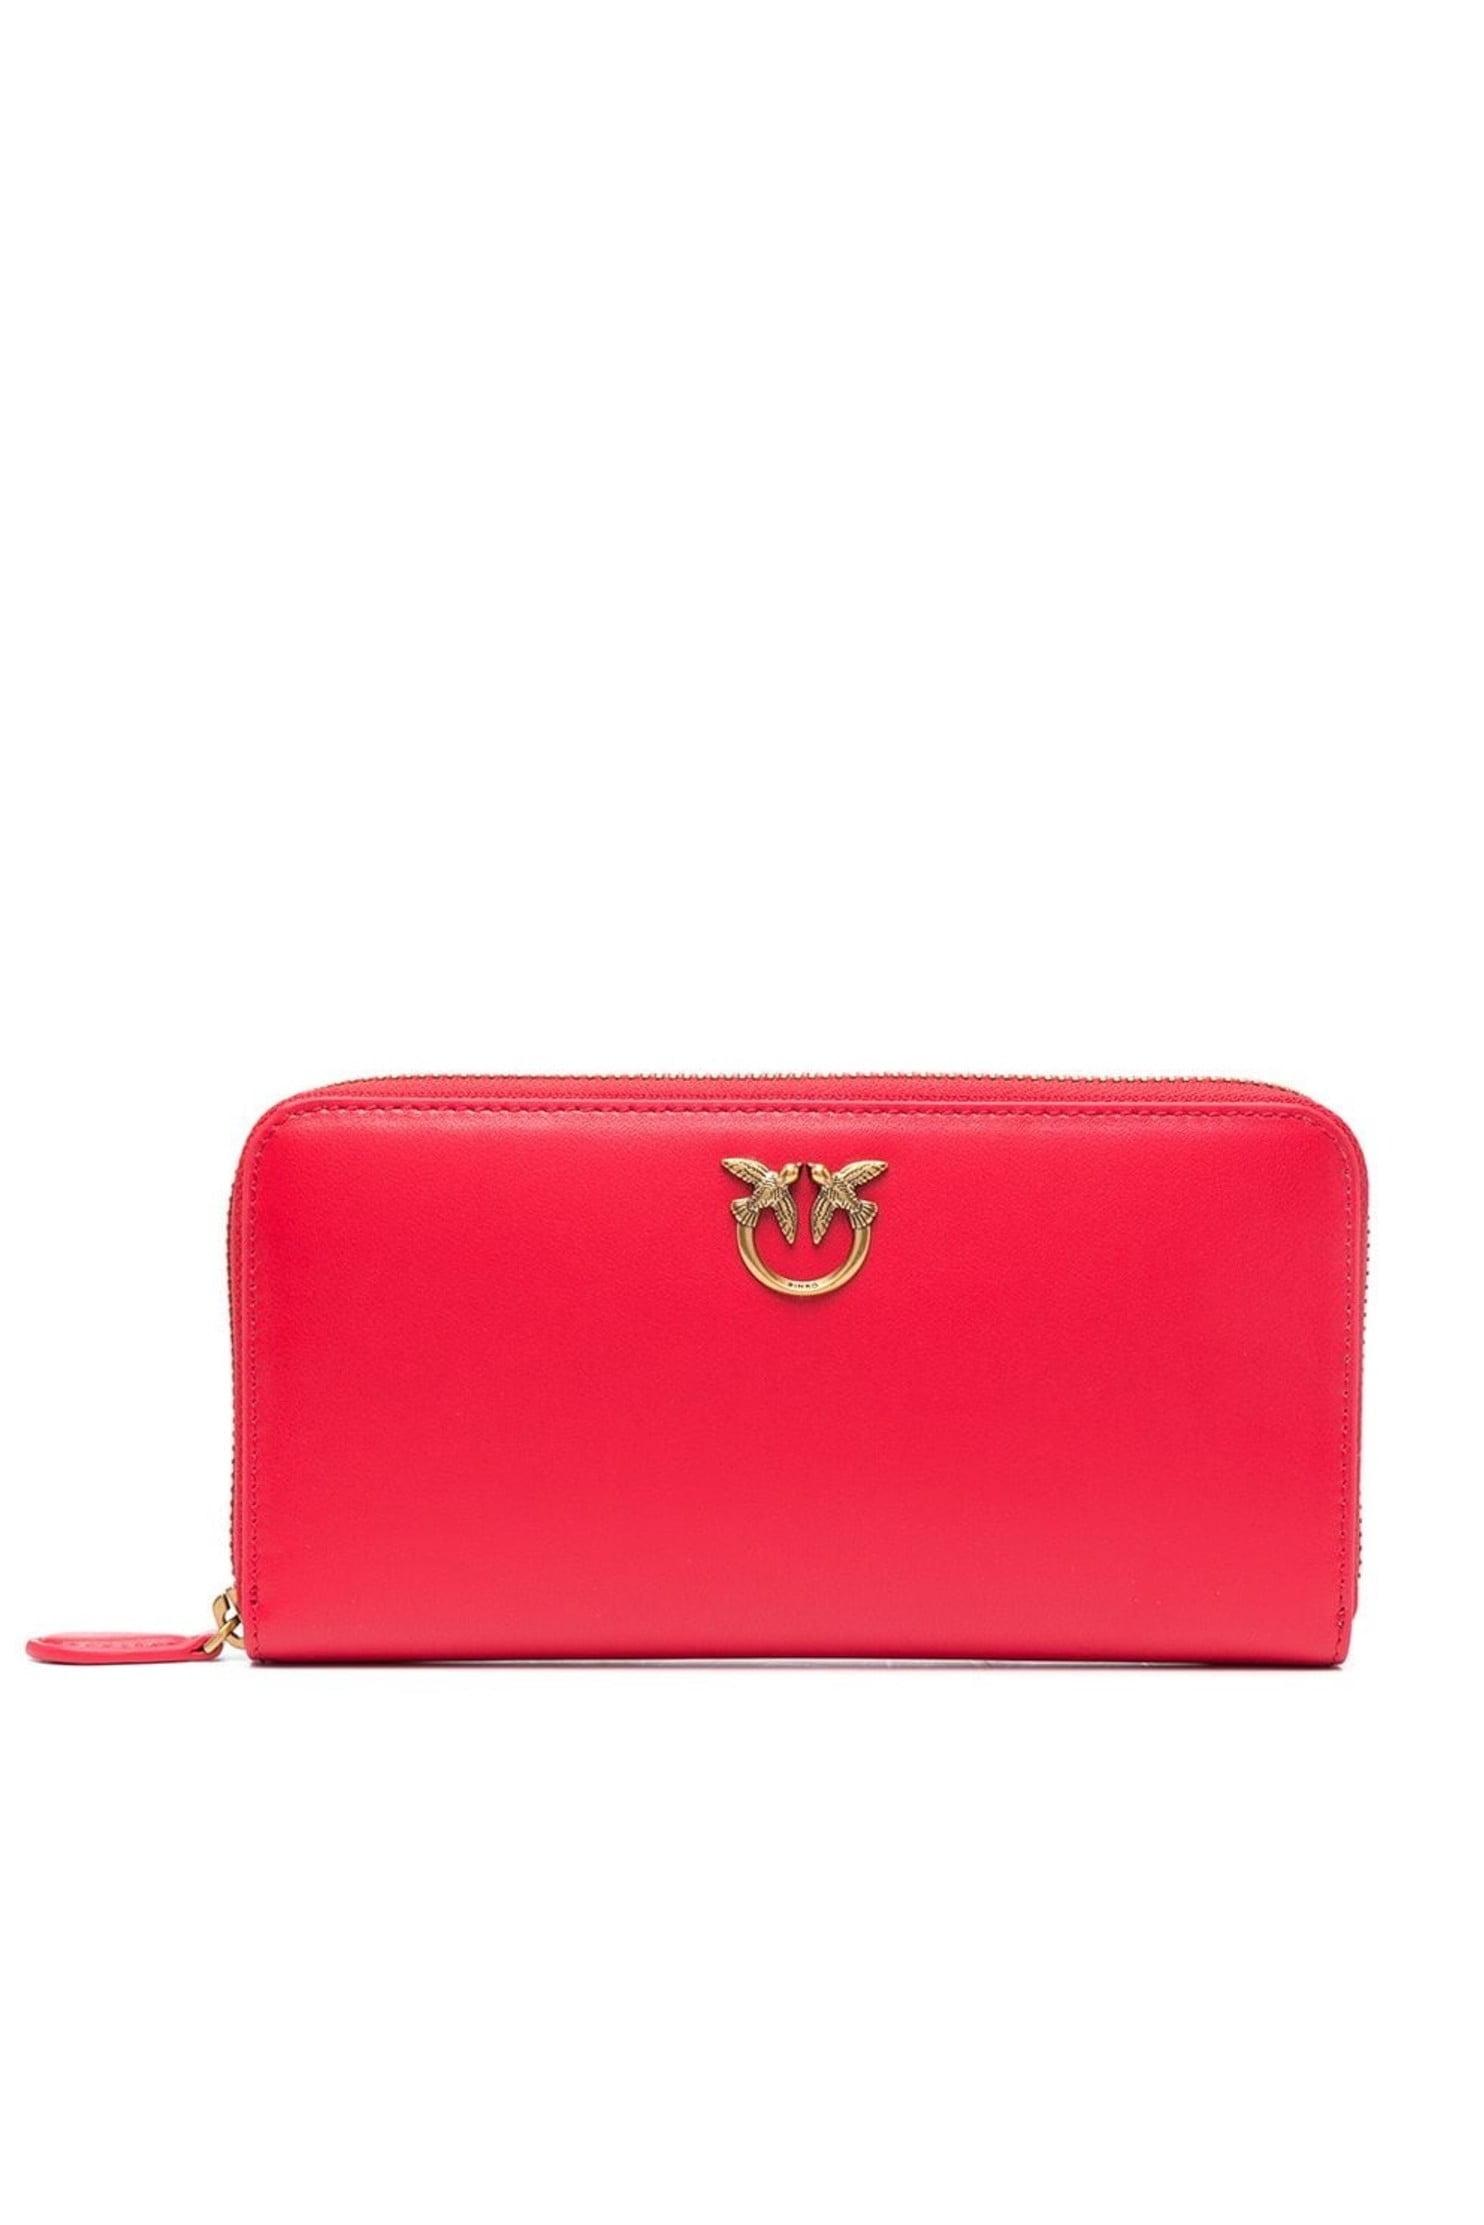 Ryder Wallet Zip Around L Simply Red